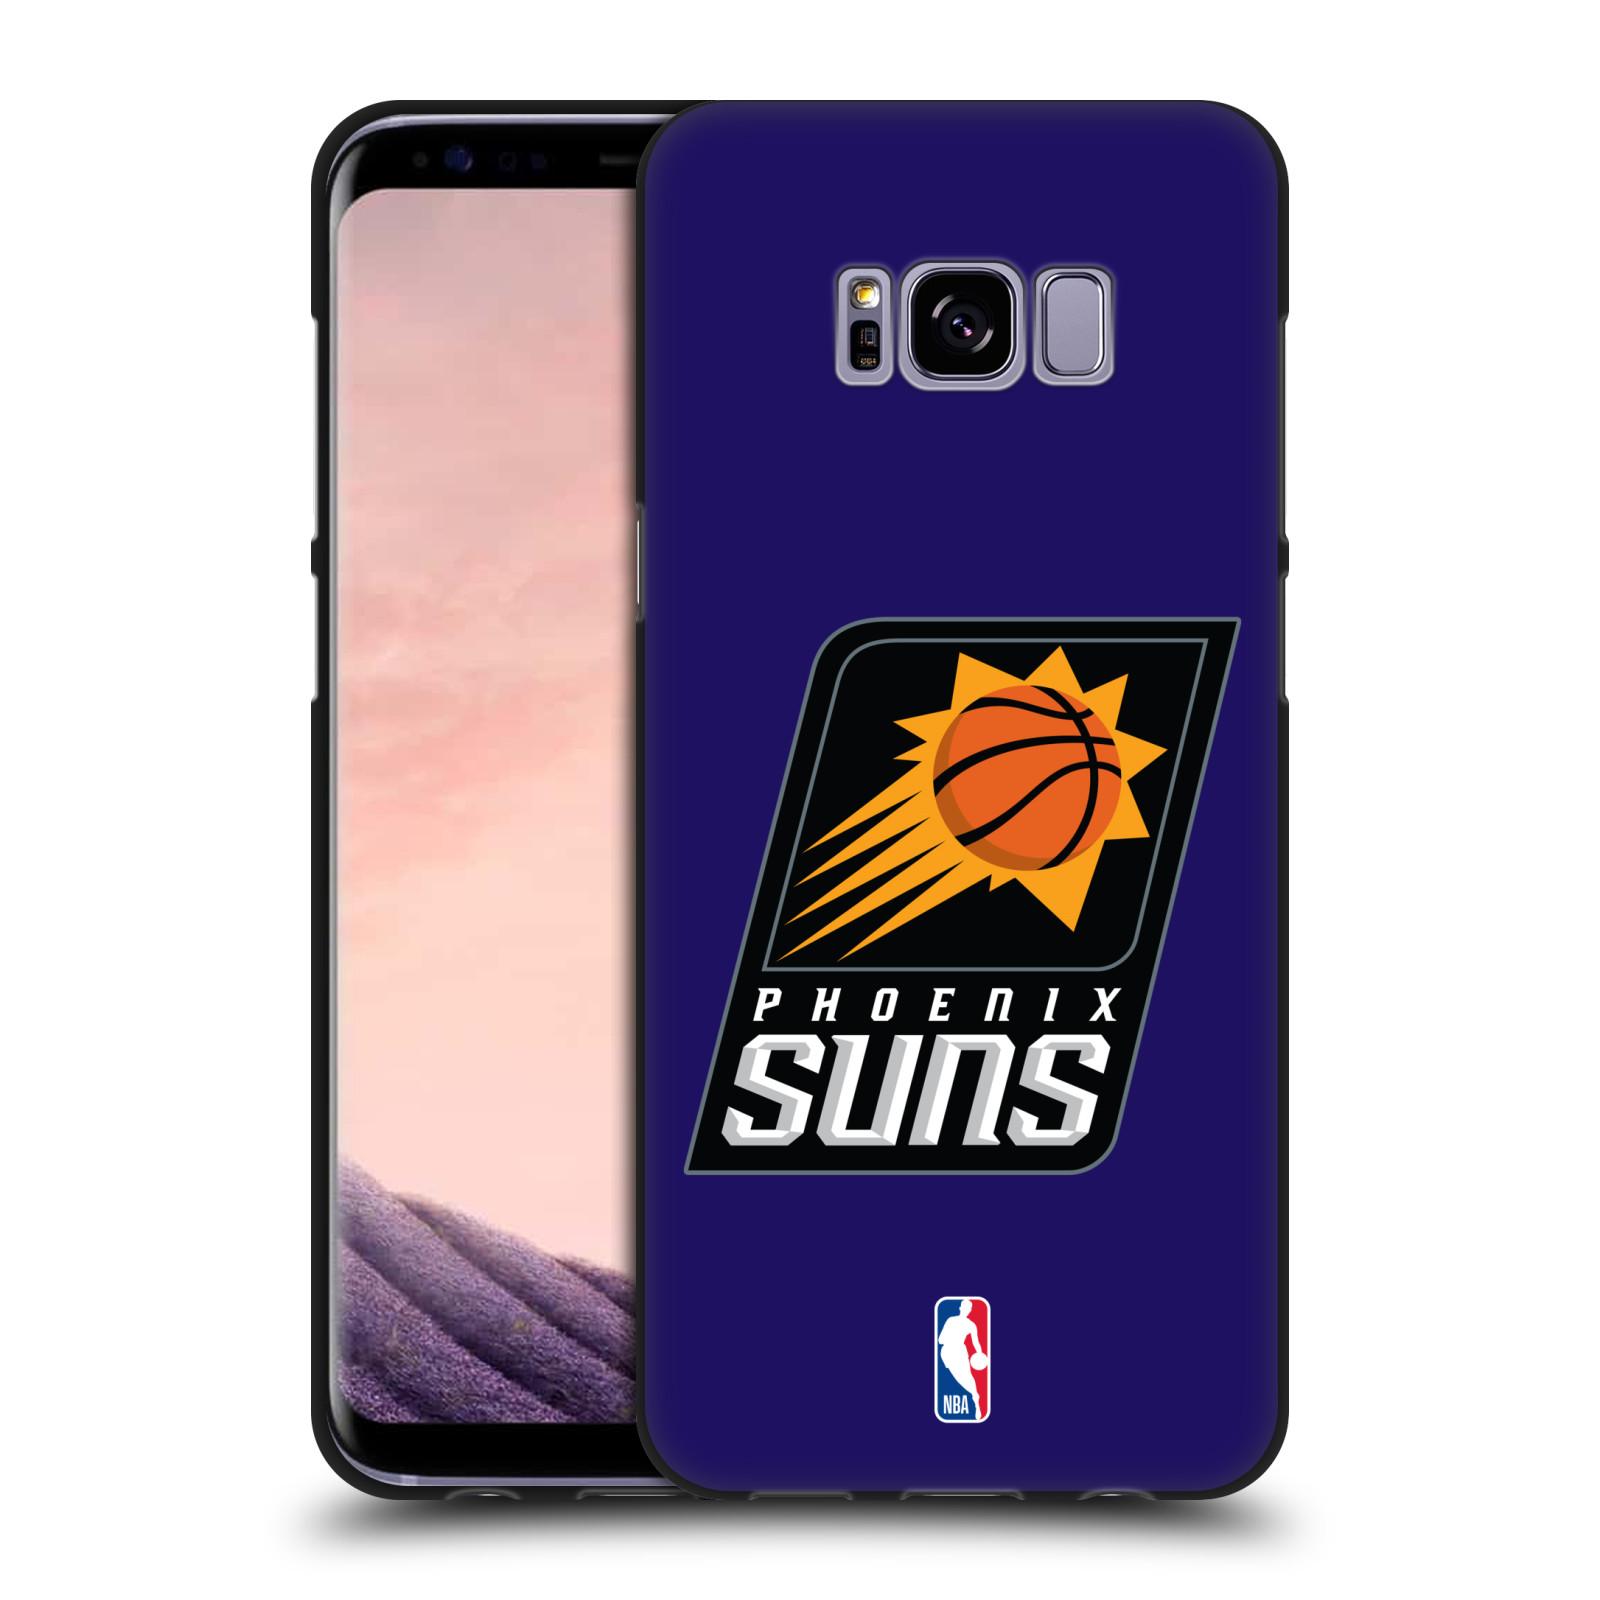 OFFICIAL-NBA-PHOENIX-SUNS-BLACK-SOFT-GEL-CASE-FOR-SAMSUNG-PHONES-1